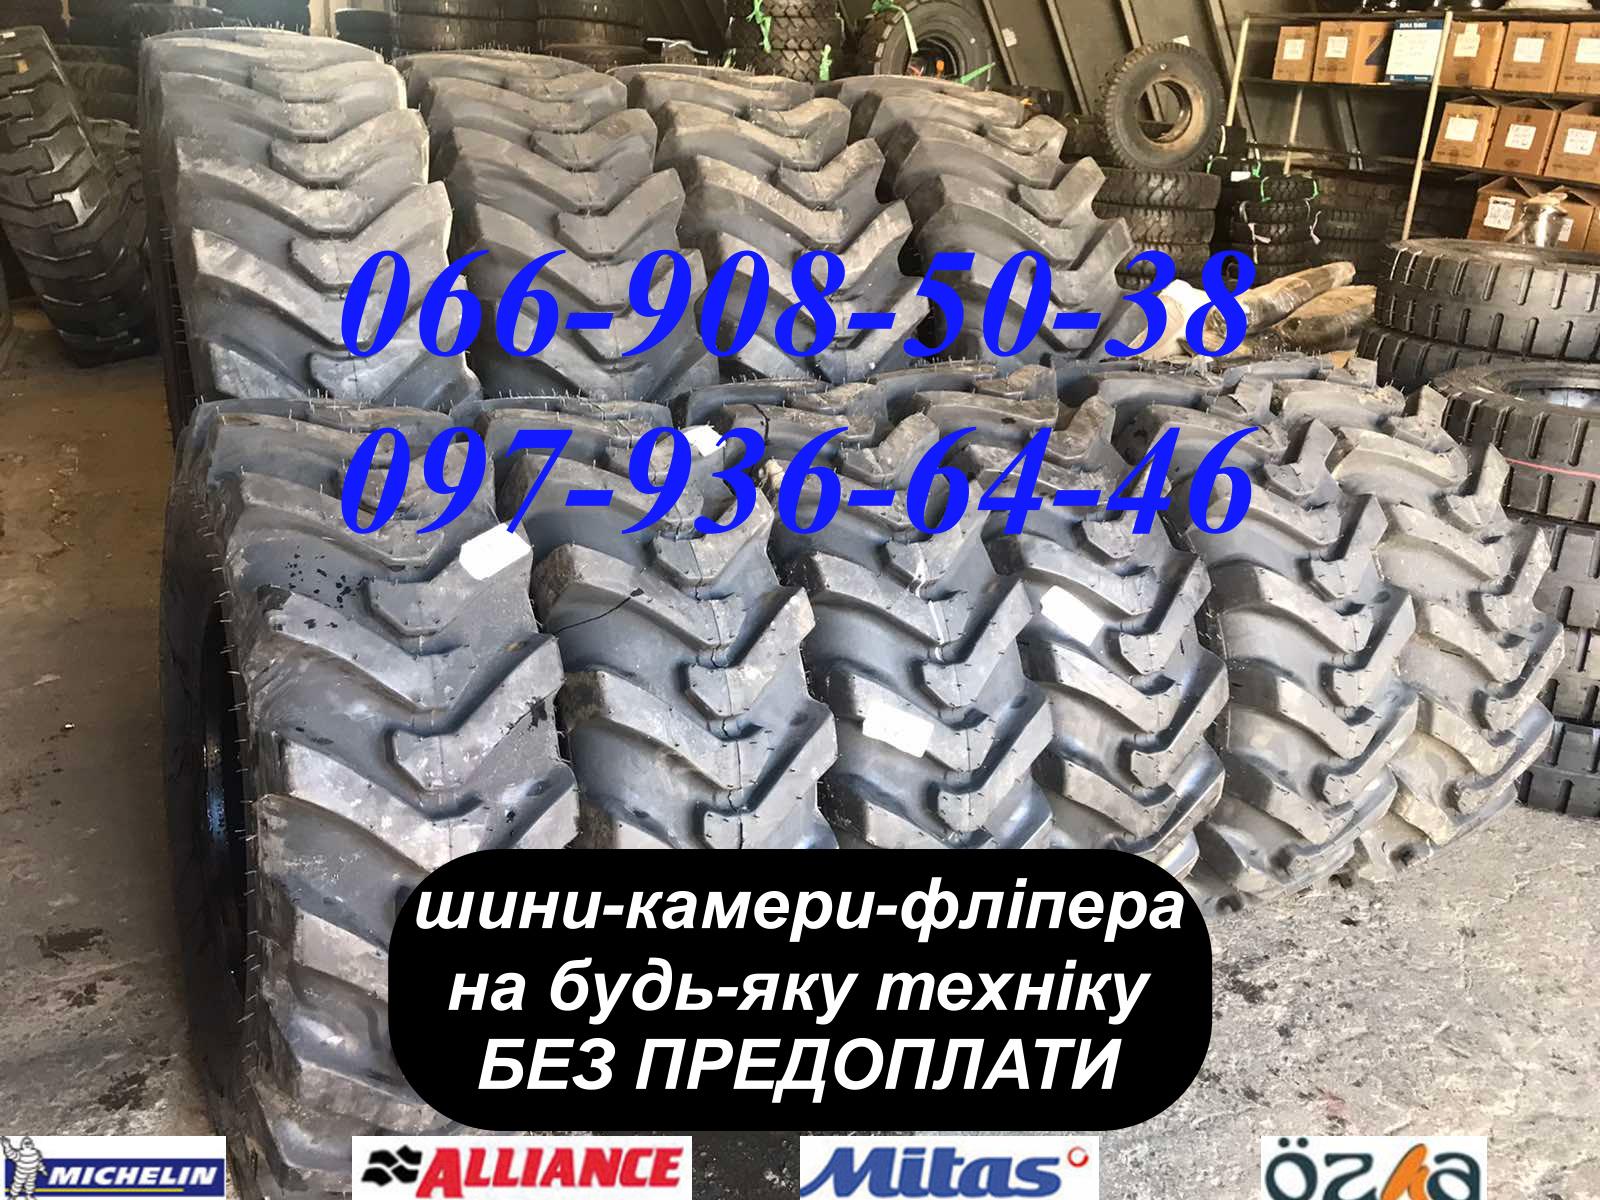 18.4-26 (480/80-26) Шины на экскаватор JCB HYUNDAI CAT